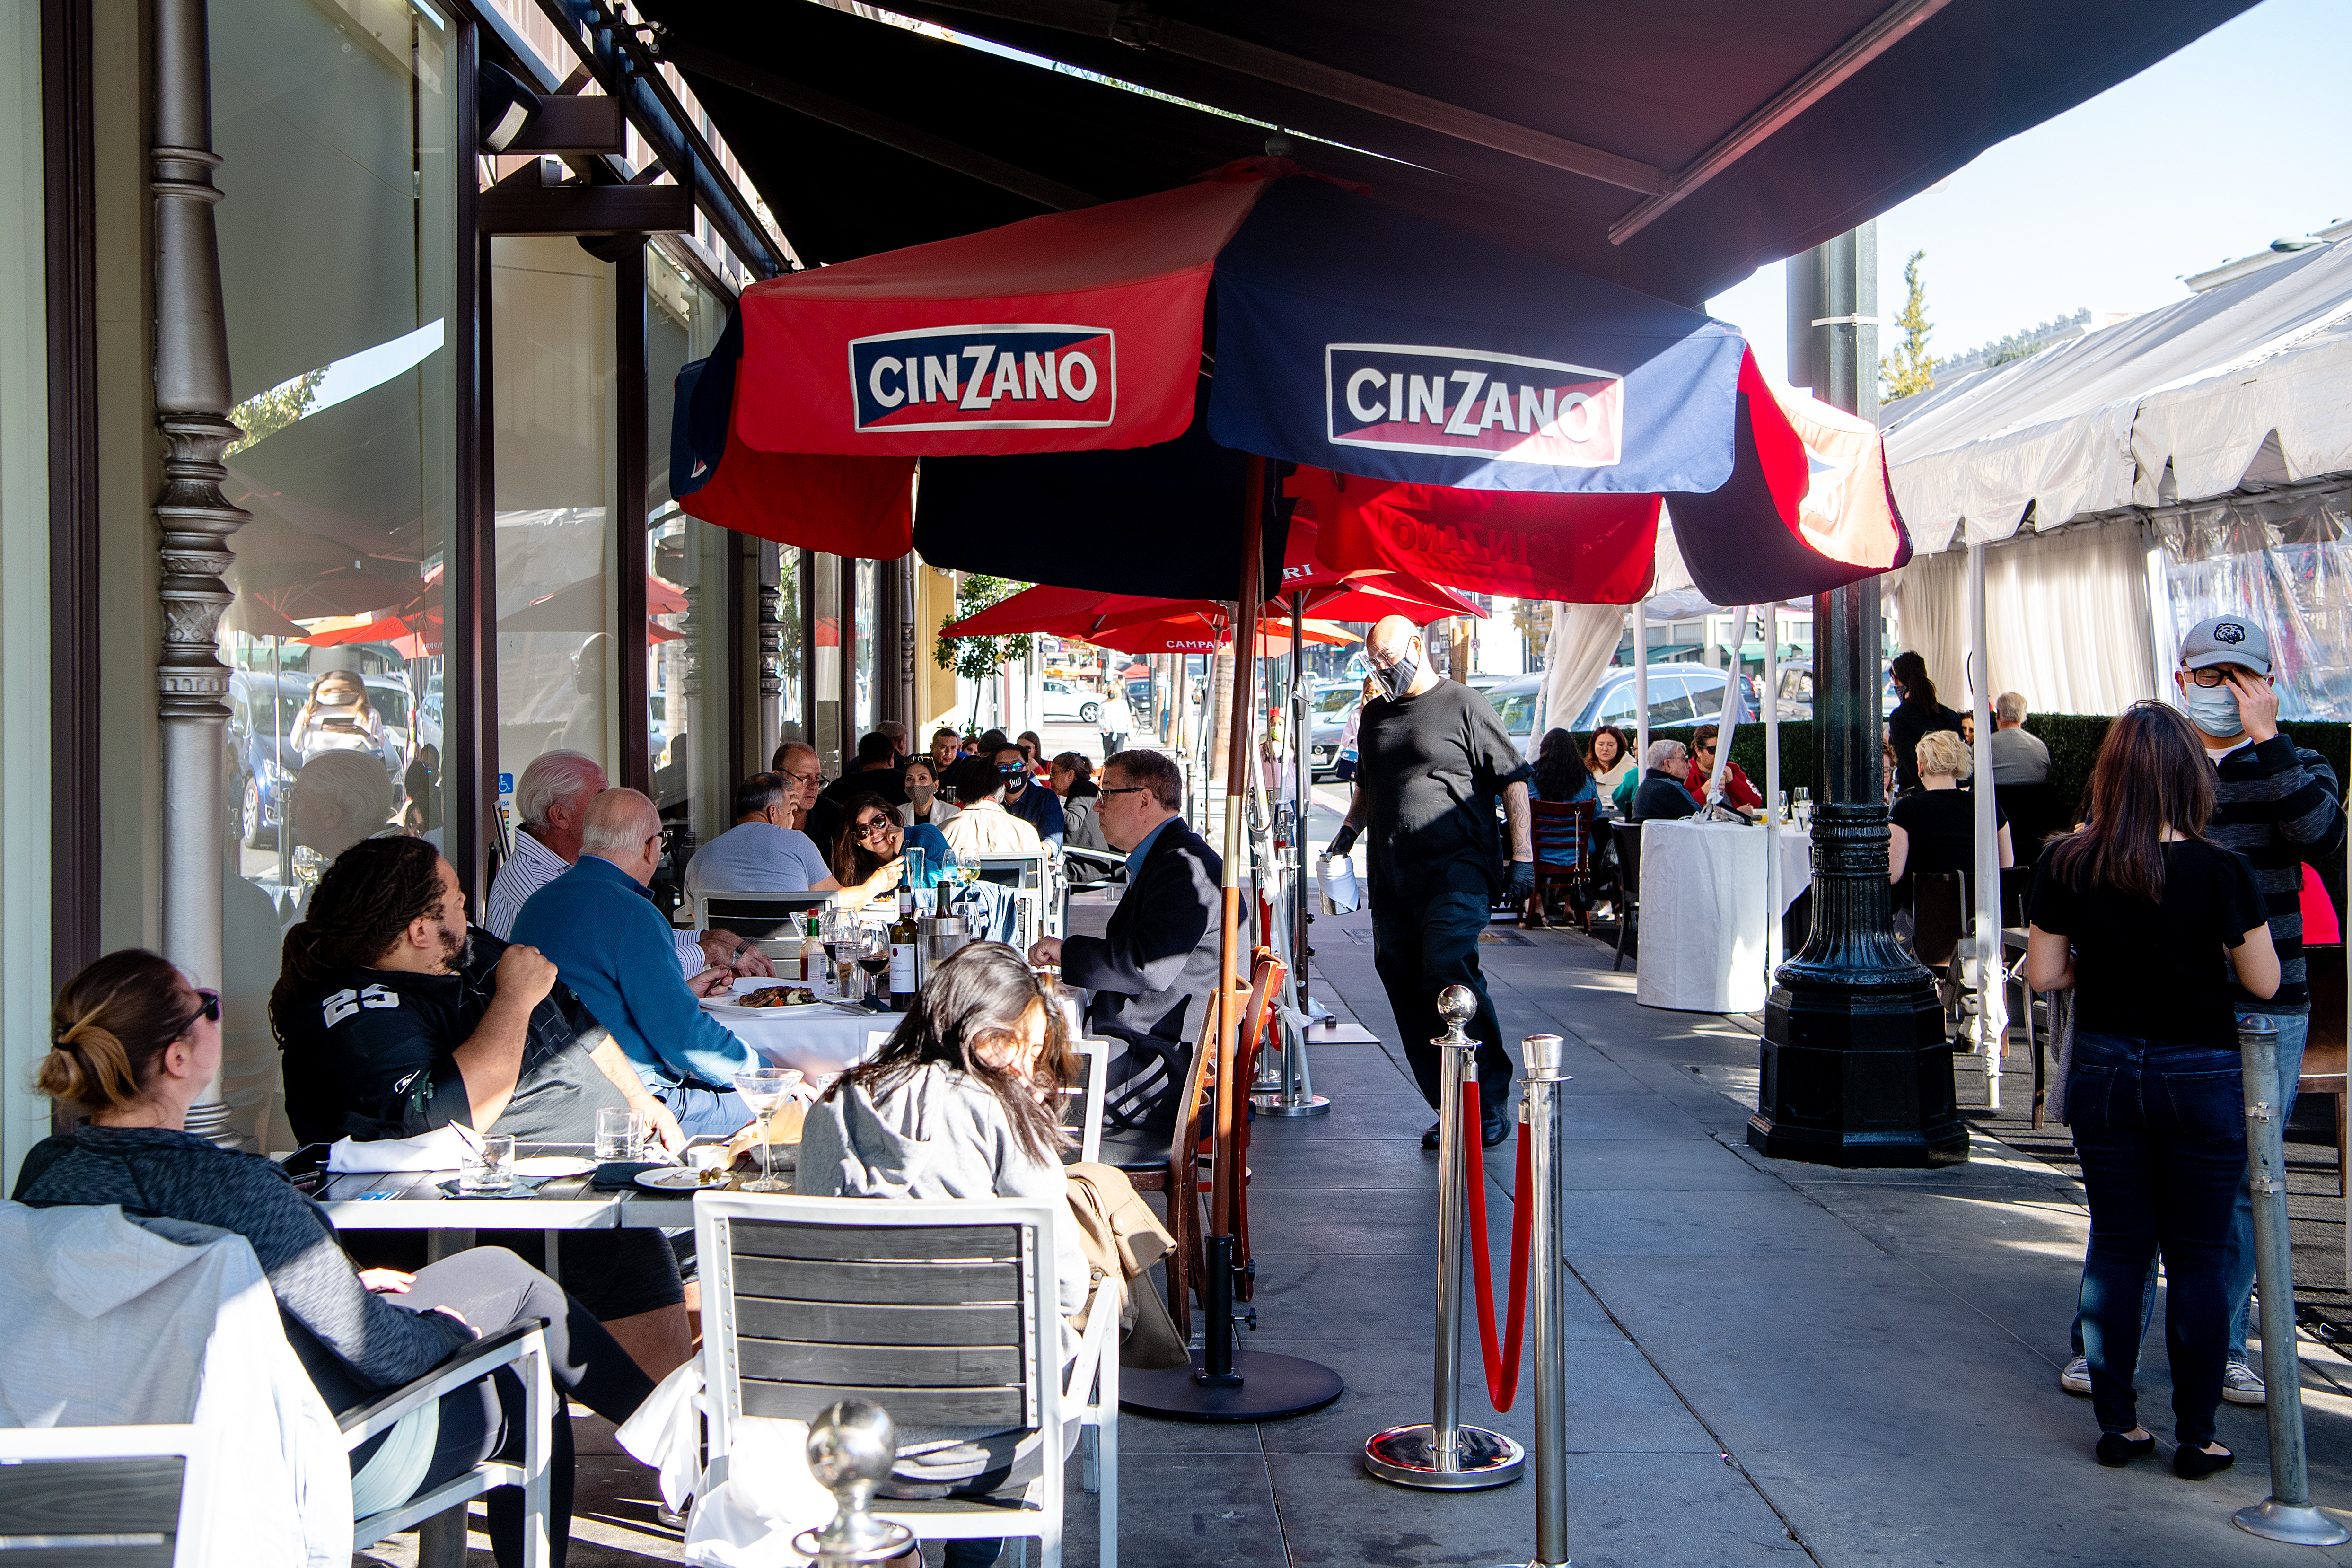 Neighborood restaurant profile of Mi Piace during coronavirus pandemic